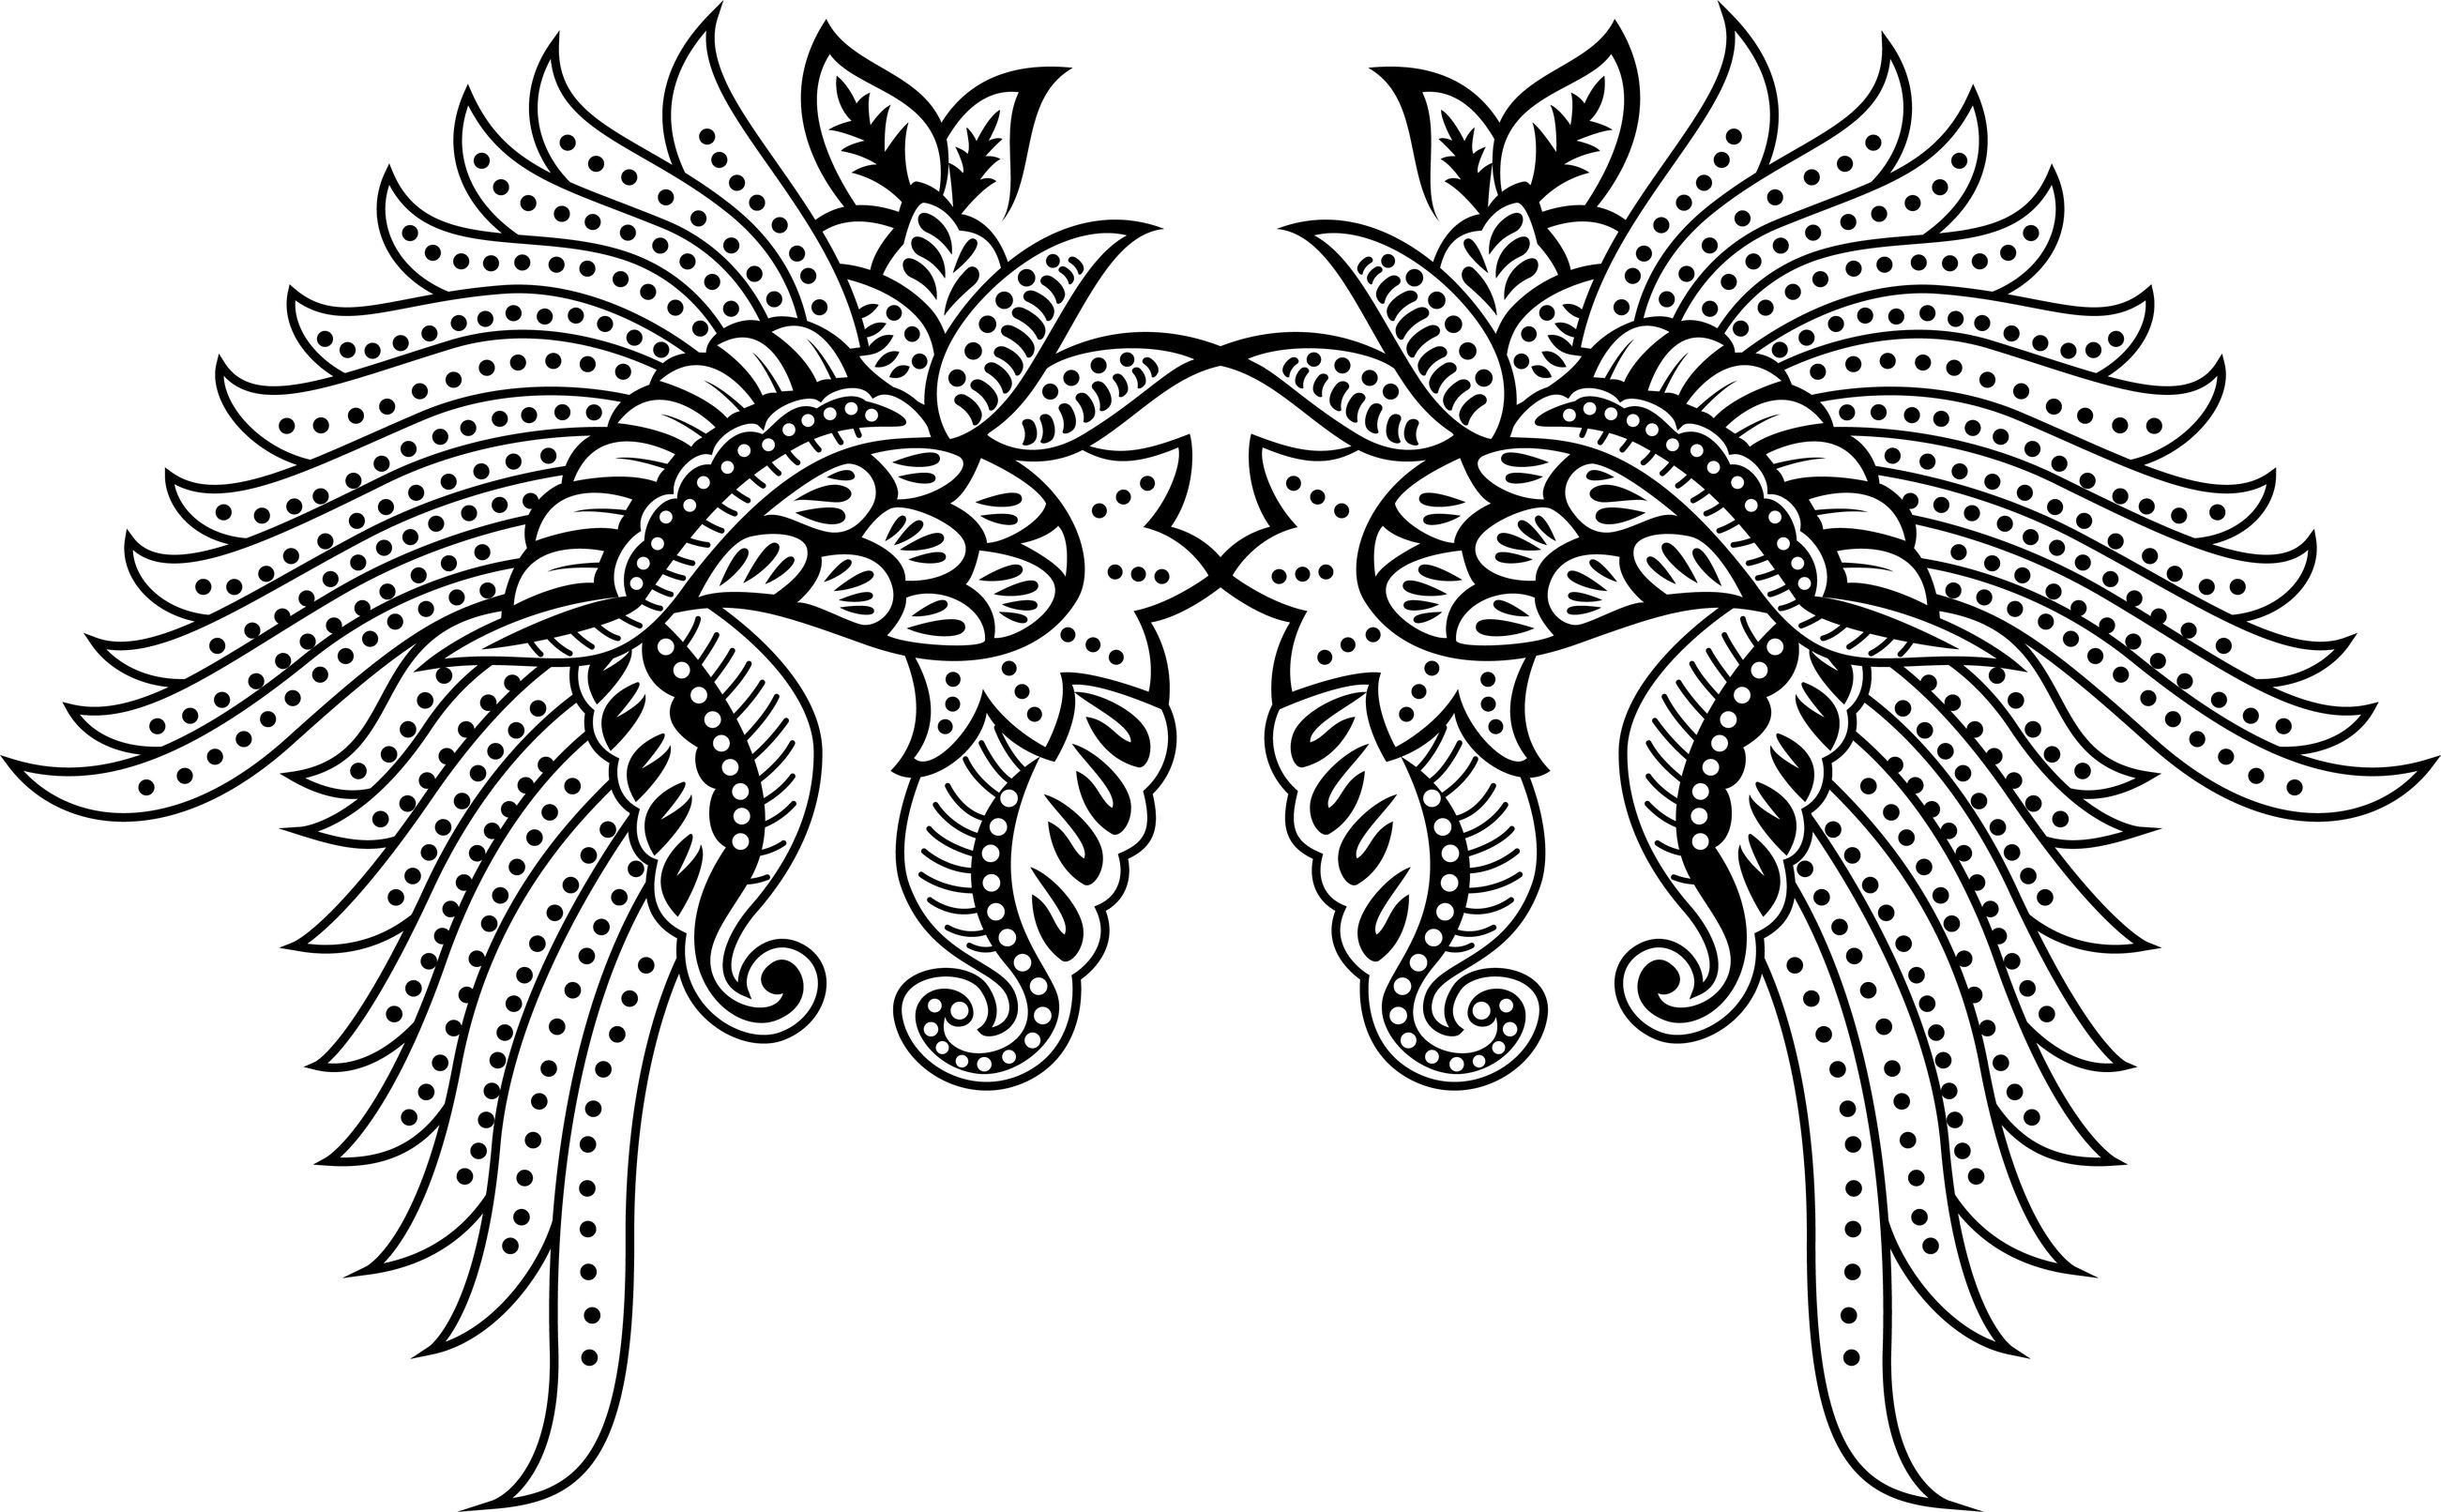 coloriage anti stress tatouage a imprimer